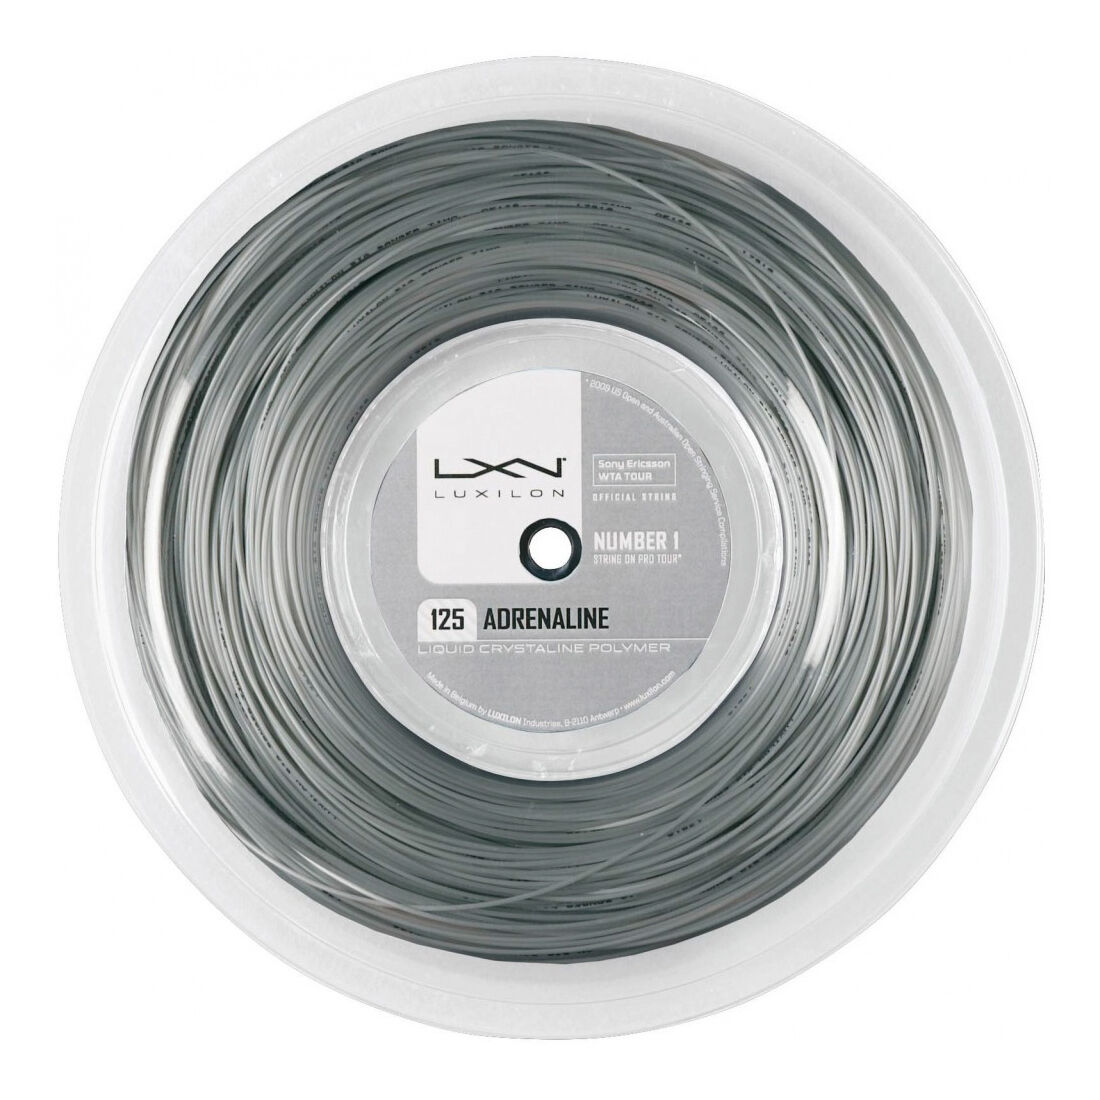 Yonex PolyTour Tough 125 Tennis Saite Bespannung Set Polyester 1,25 mm NEU